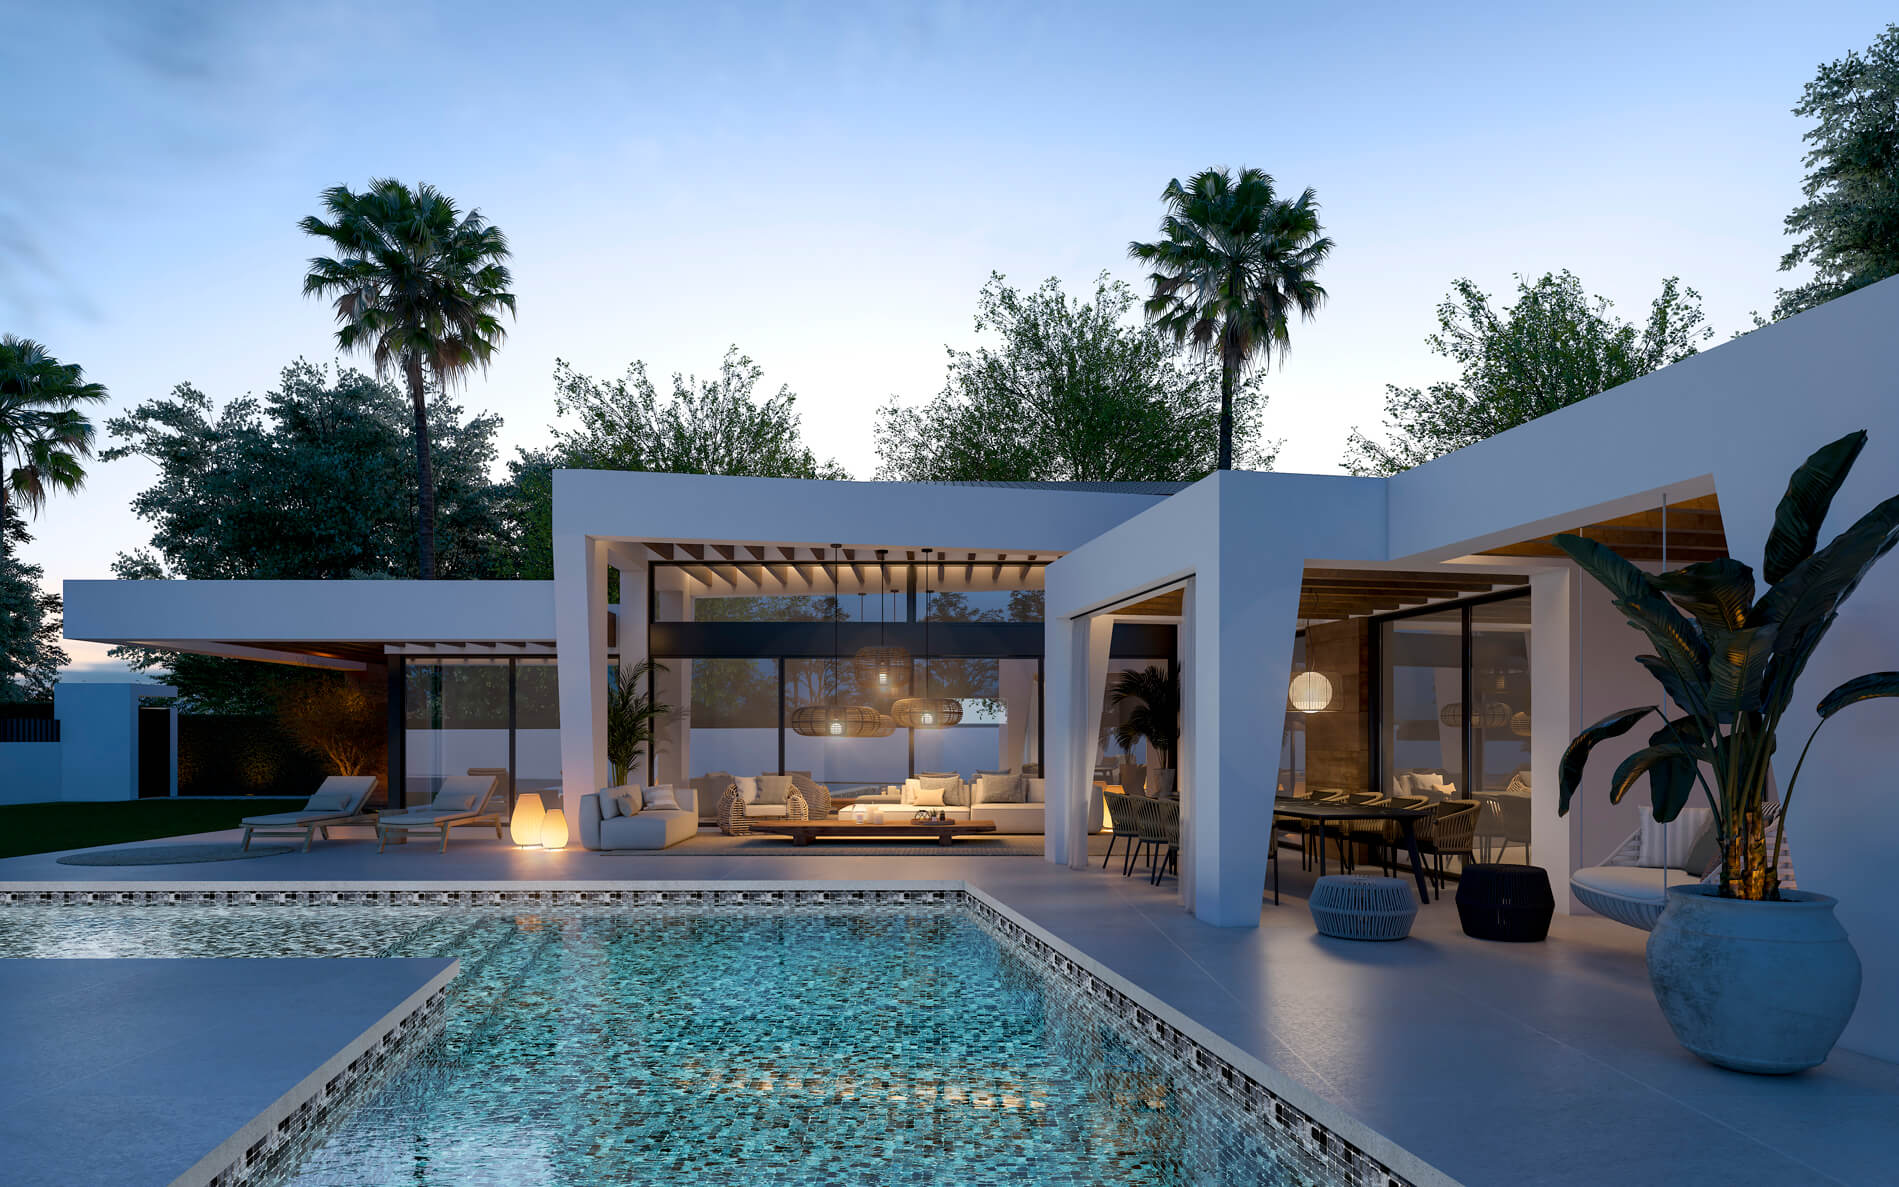 marein natura nueva andalucia moderne nieuwbouw villa laurus kopen vamoz marbella costa del sol spanje zwembad